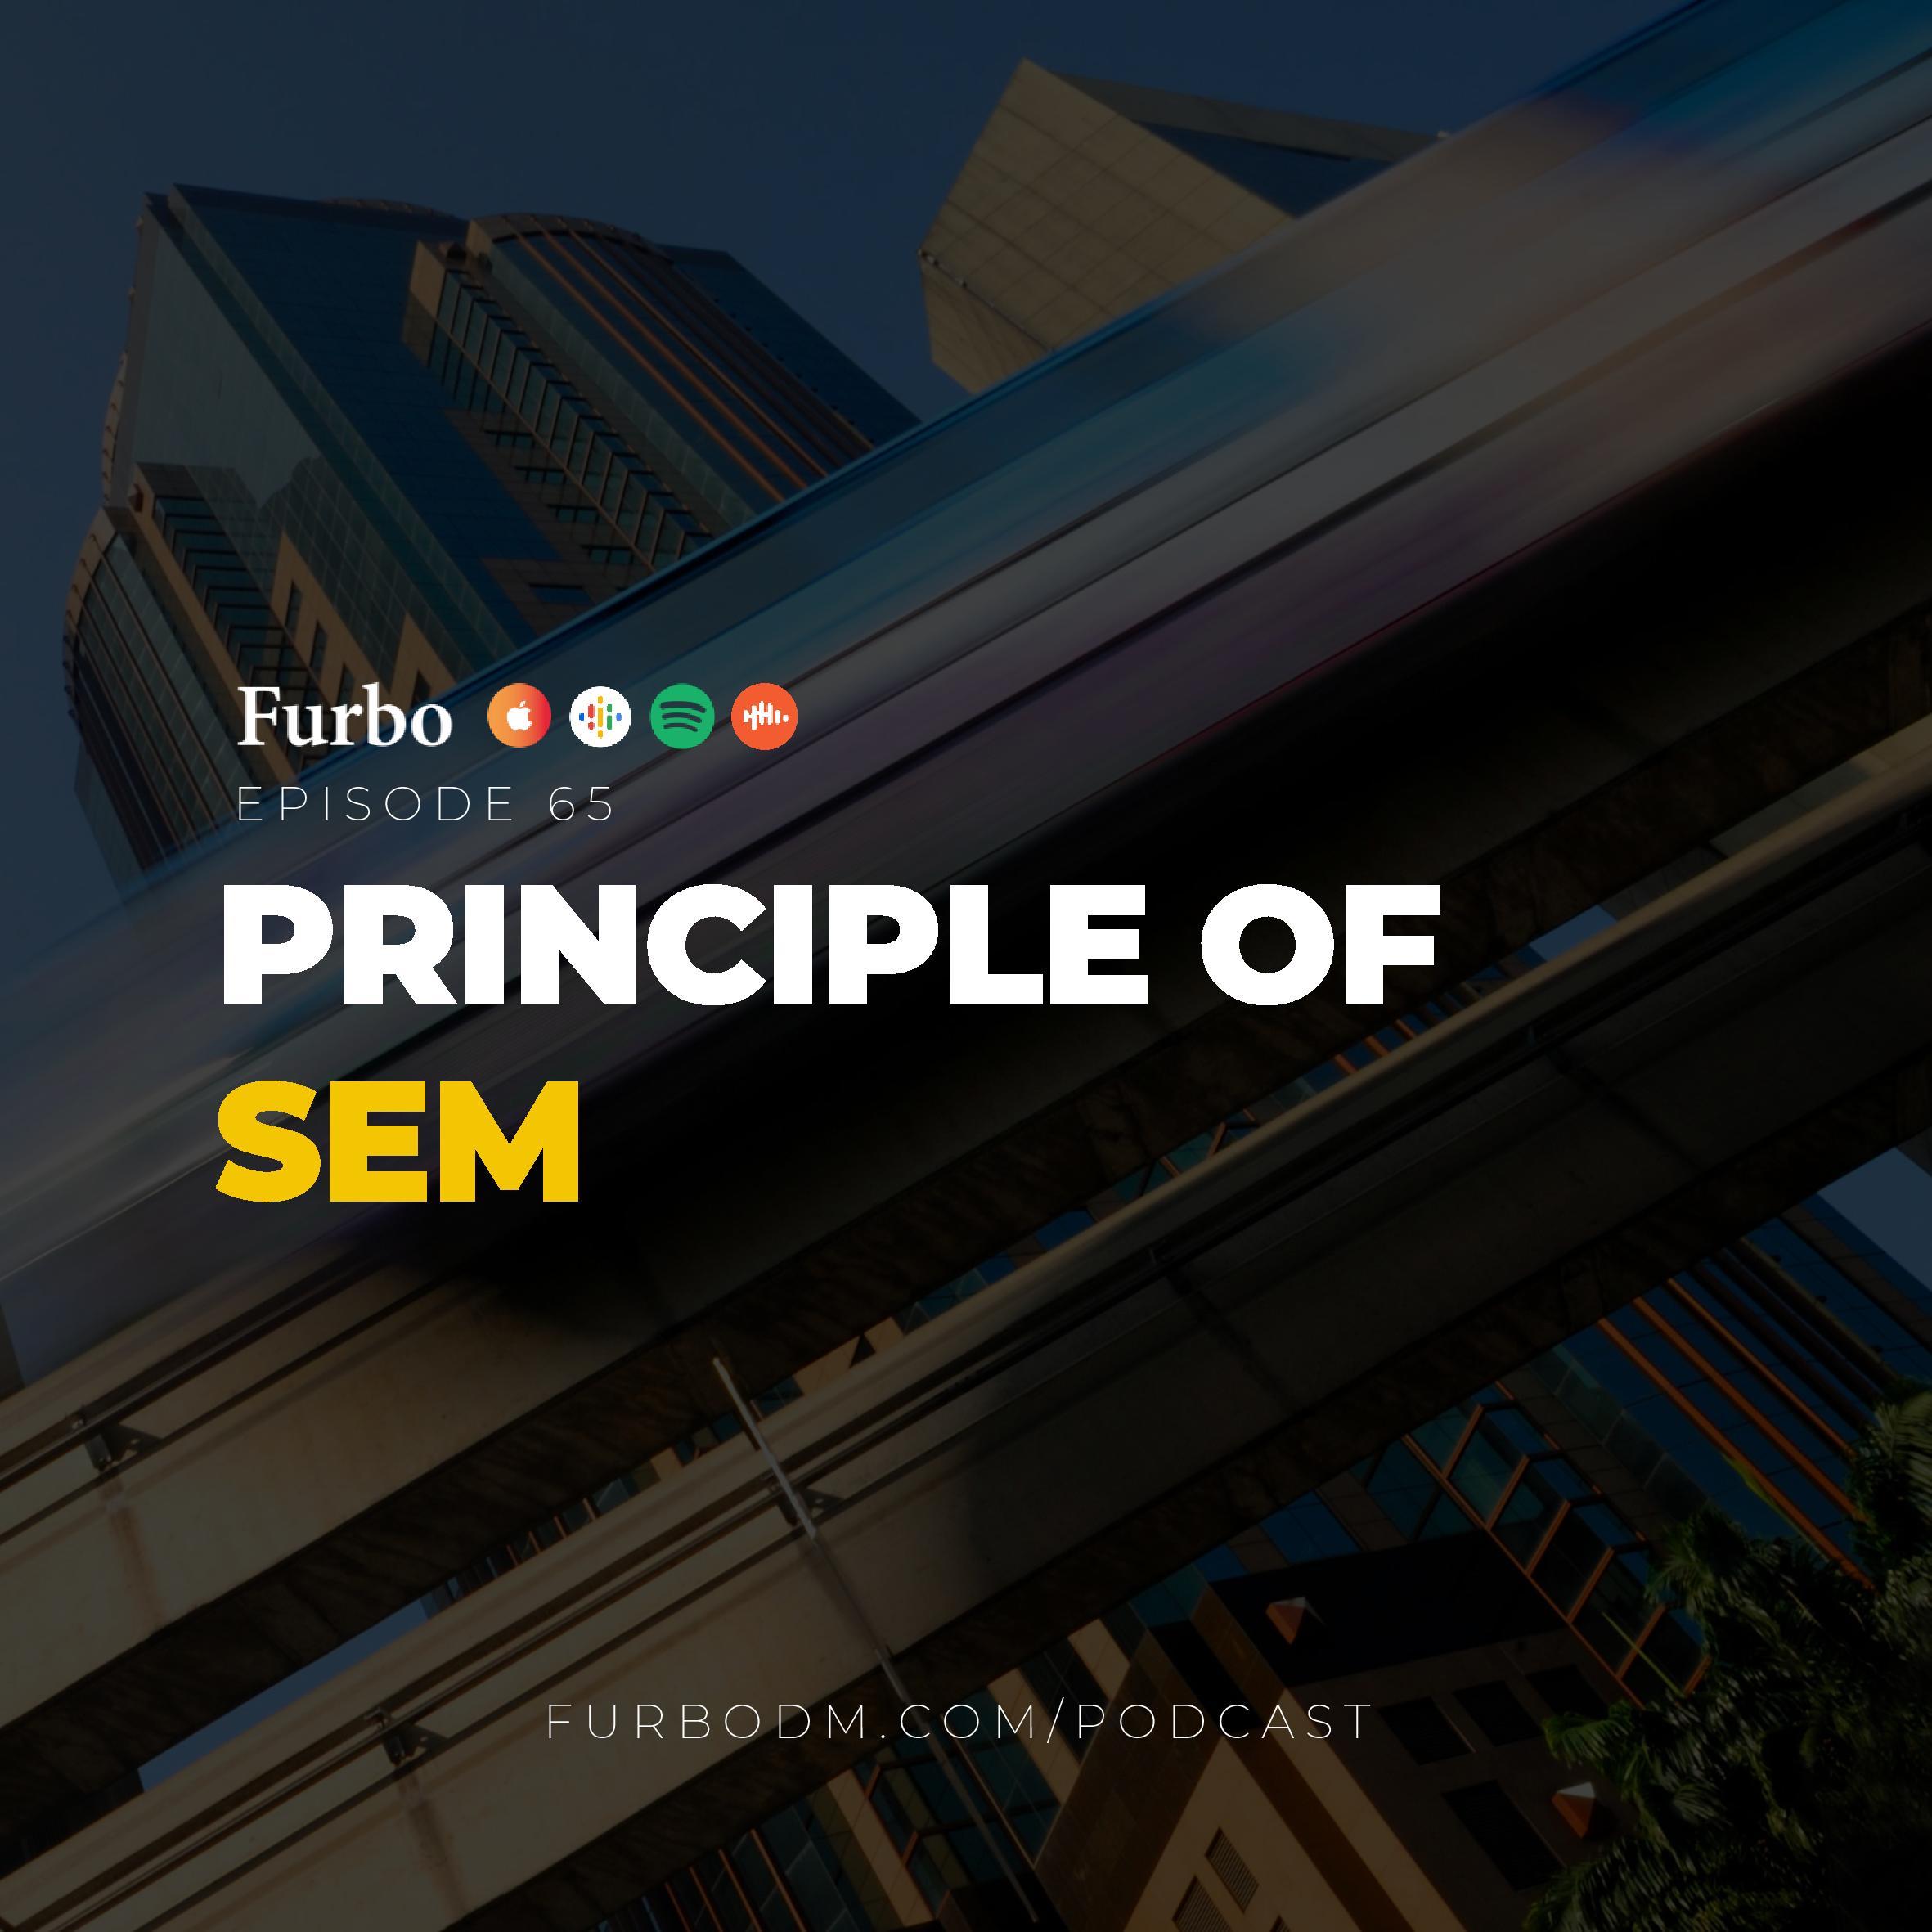 E65: Principle of SEM | اصول بازاریابی موتور جستجو و راههای جذب کاربر